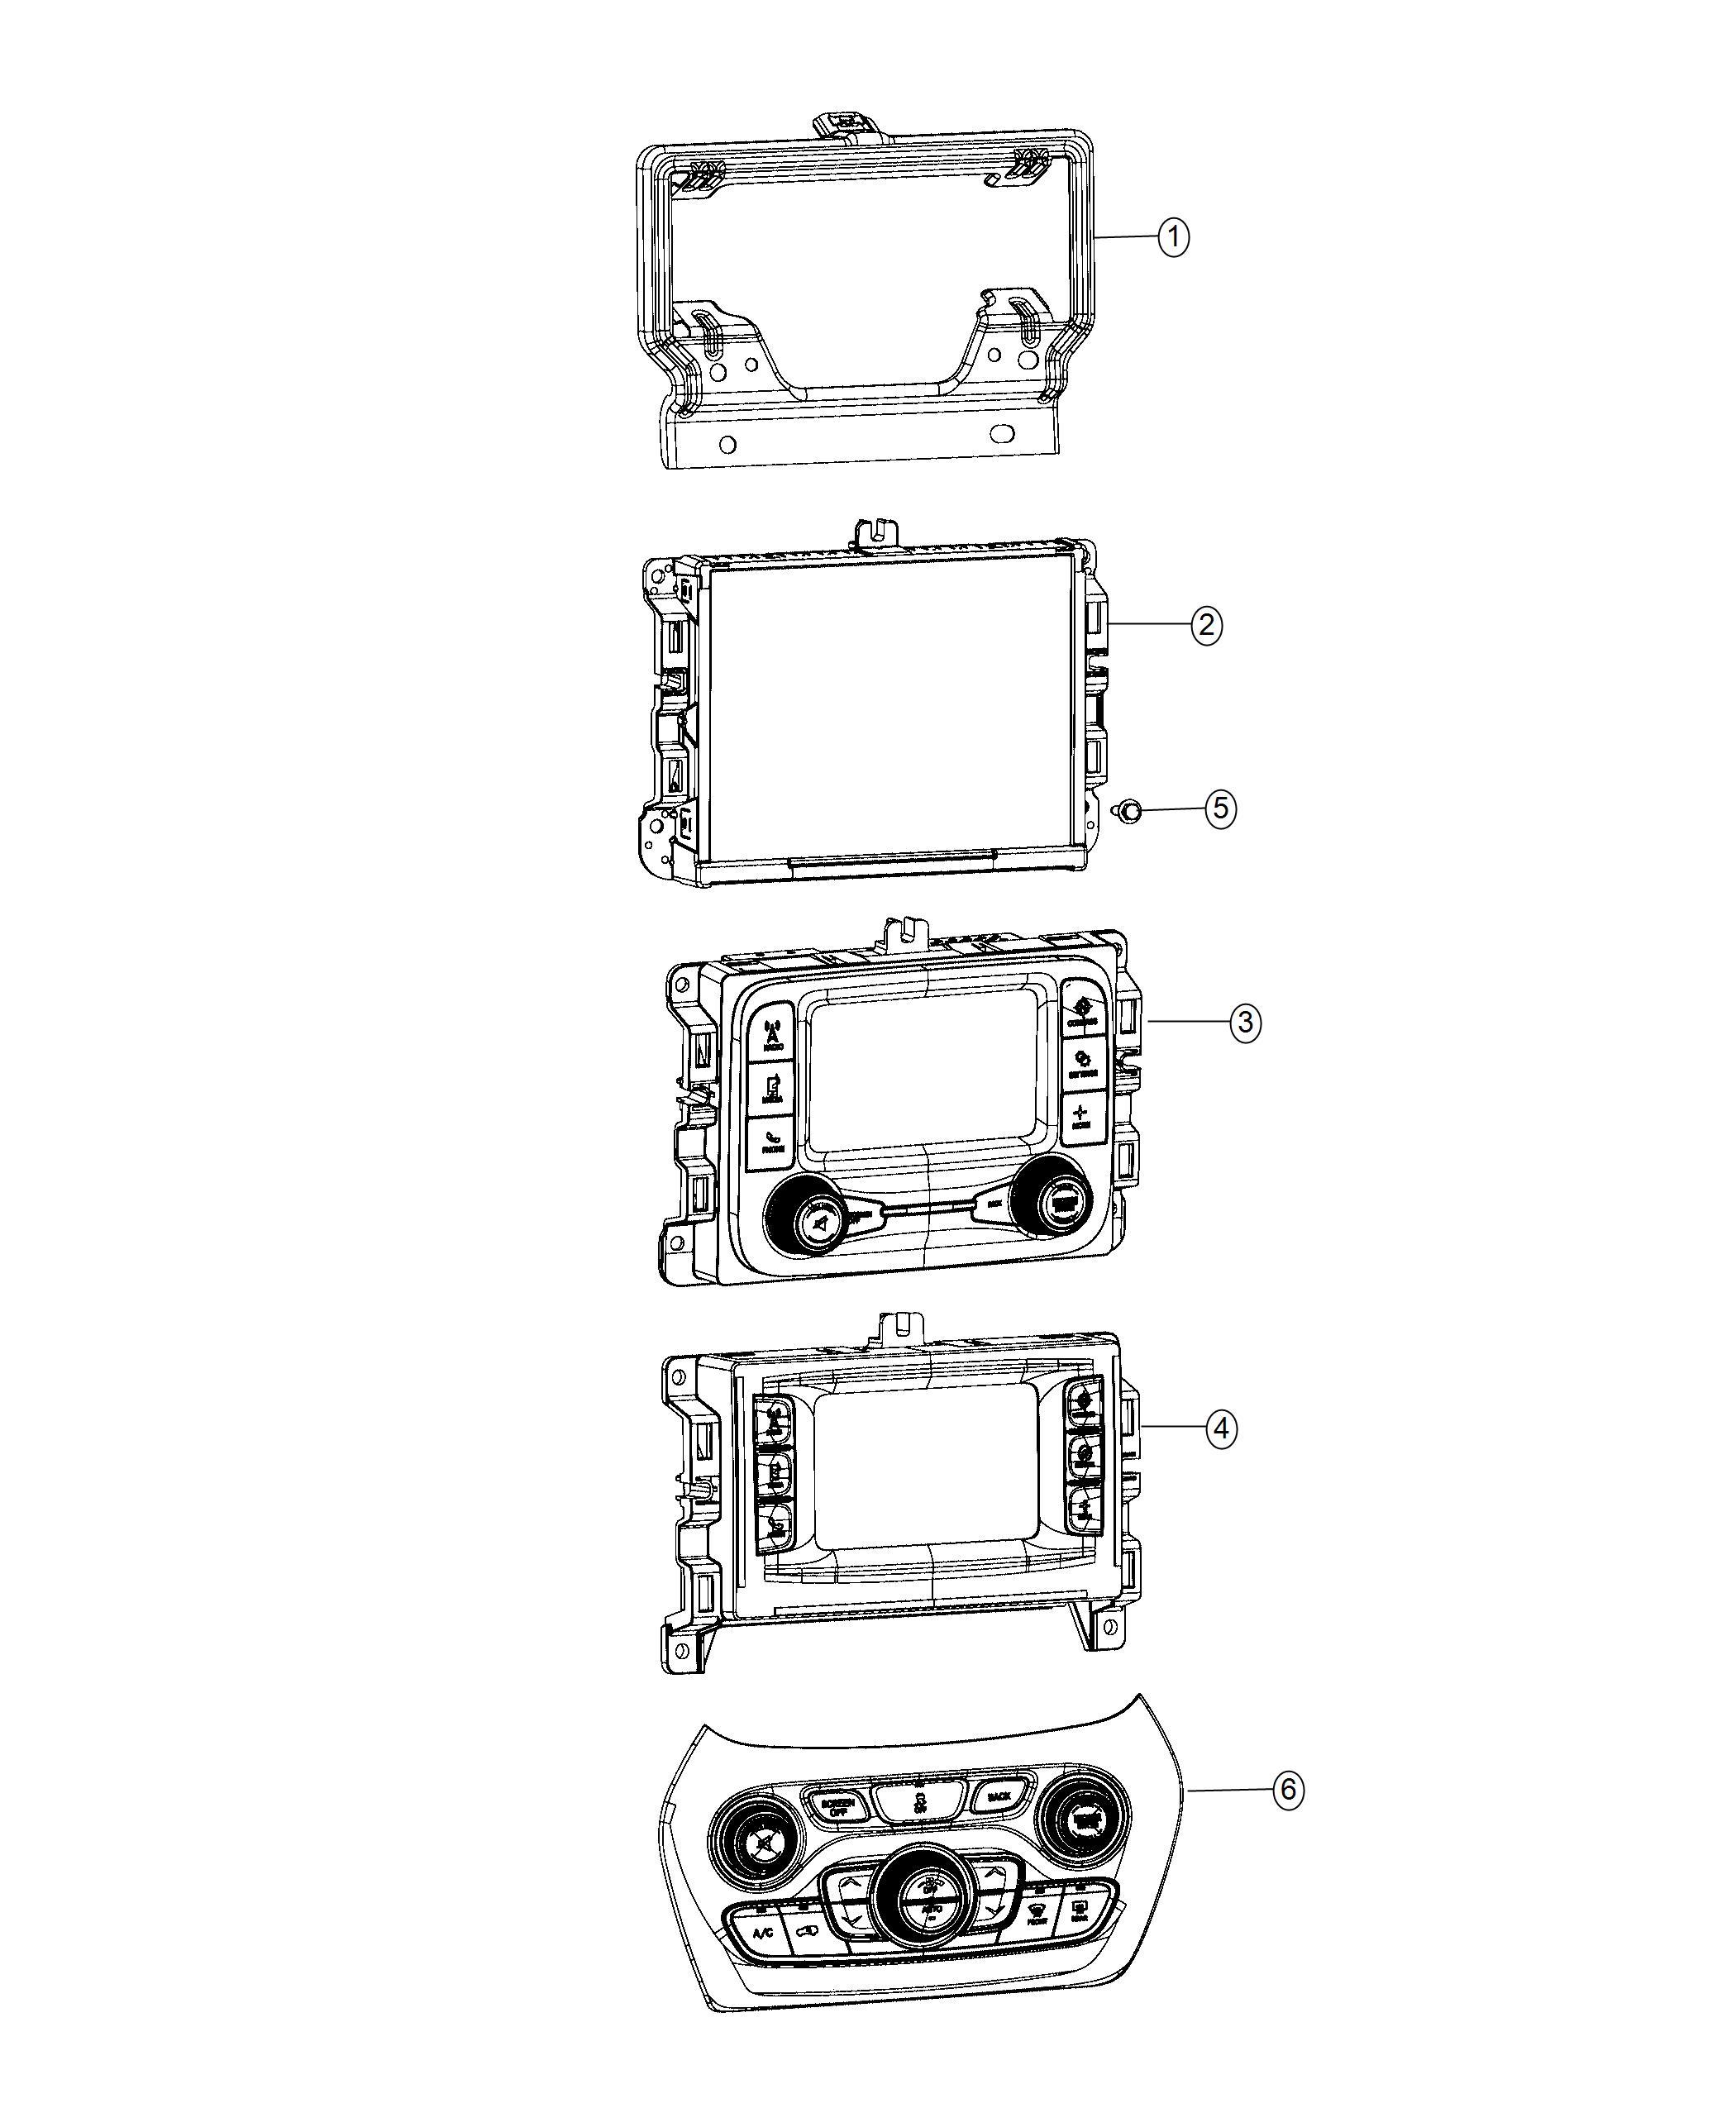 Jeep Cherokee Radio Multi Media Instrument Panel Parts